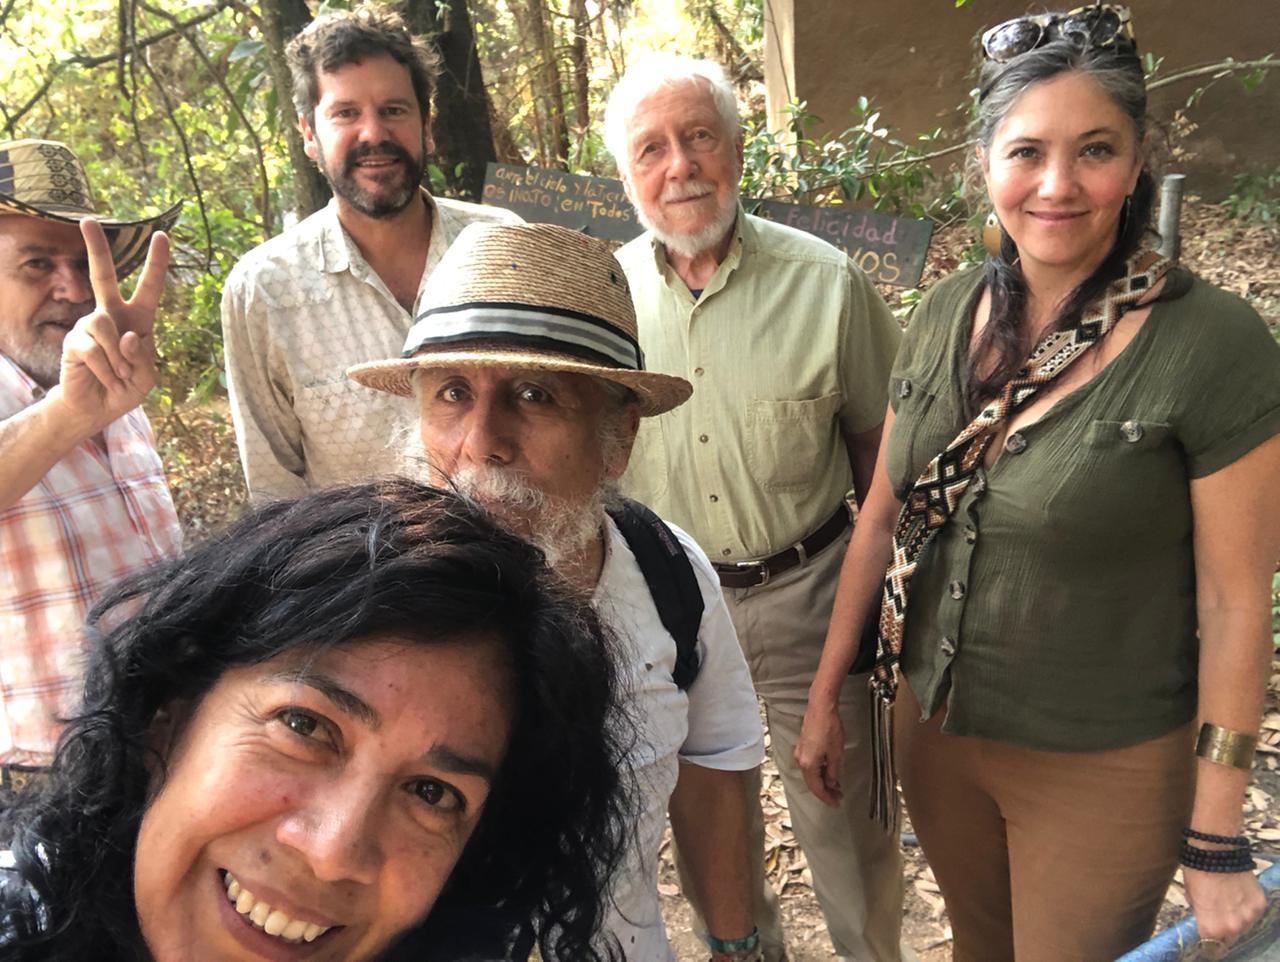 http://lasombradelsabino.com.mx/wp-content/uploads/2021/07/conversatorio.jpeg